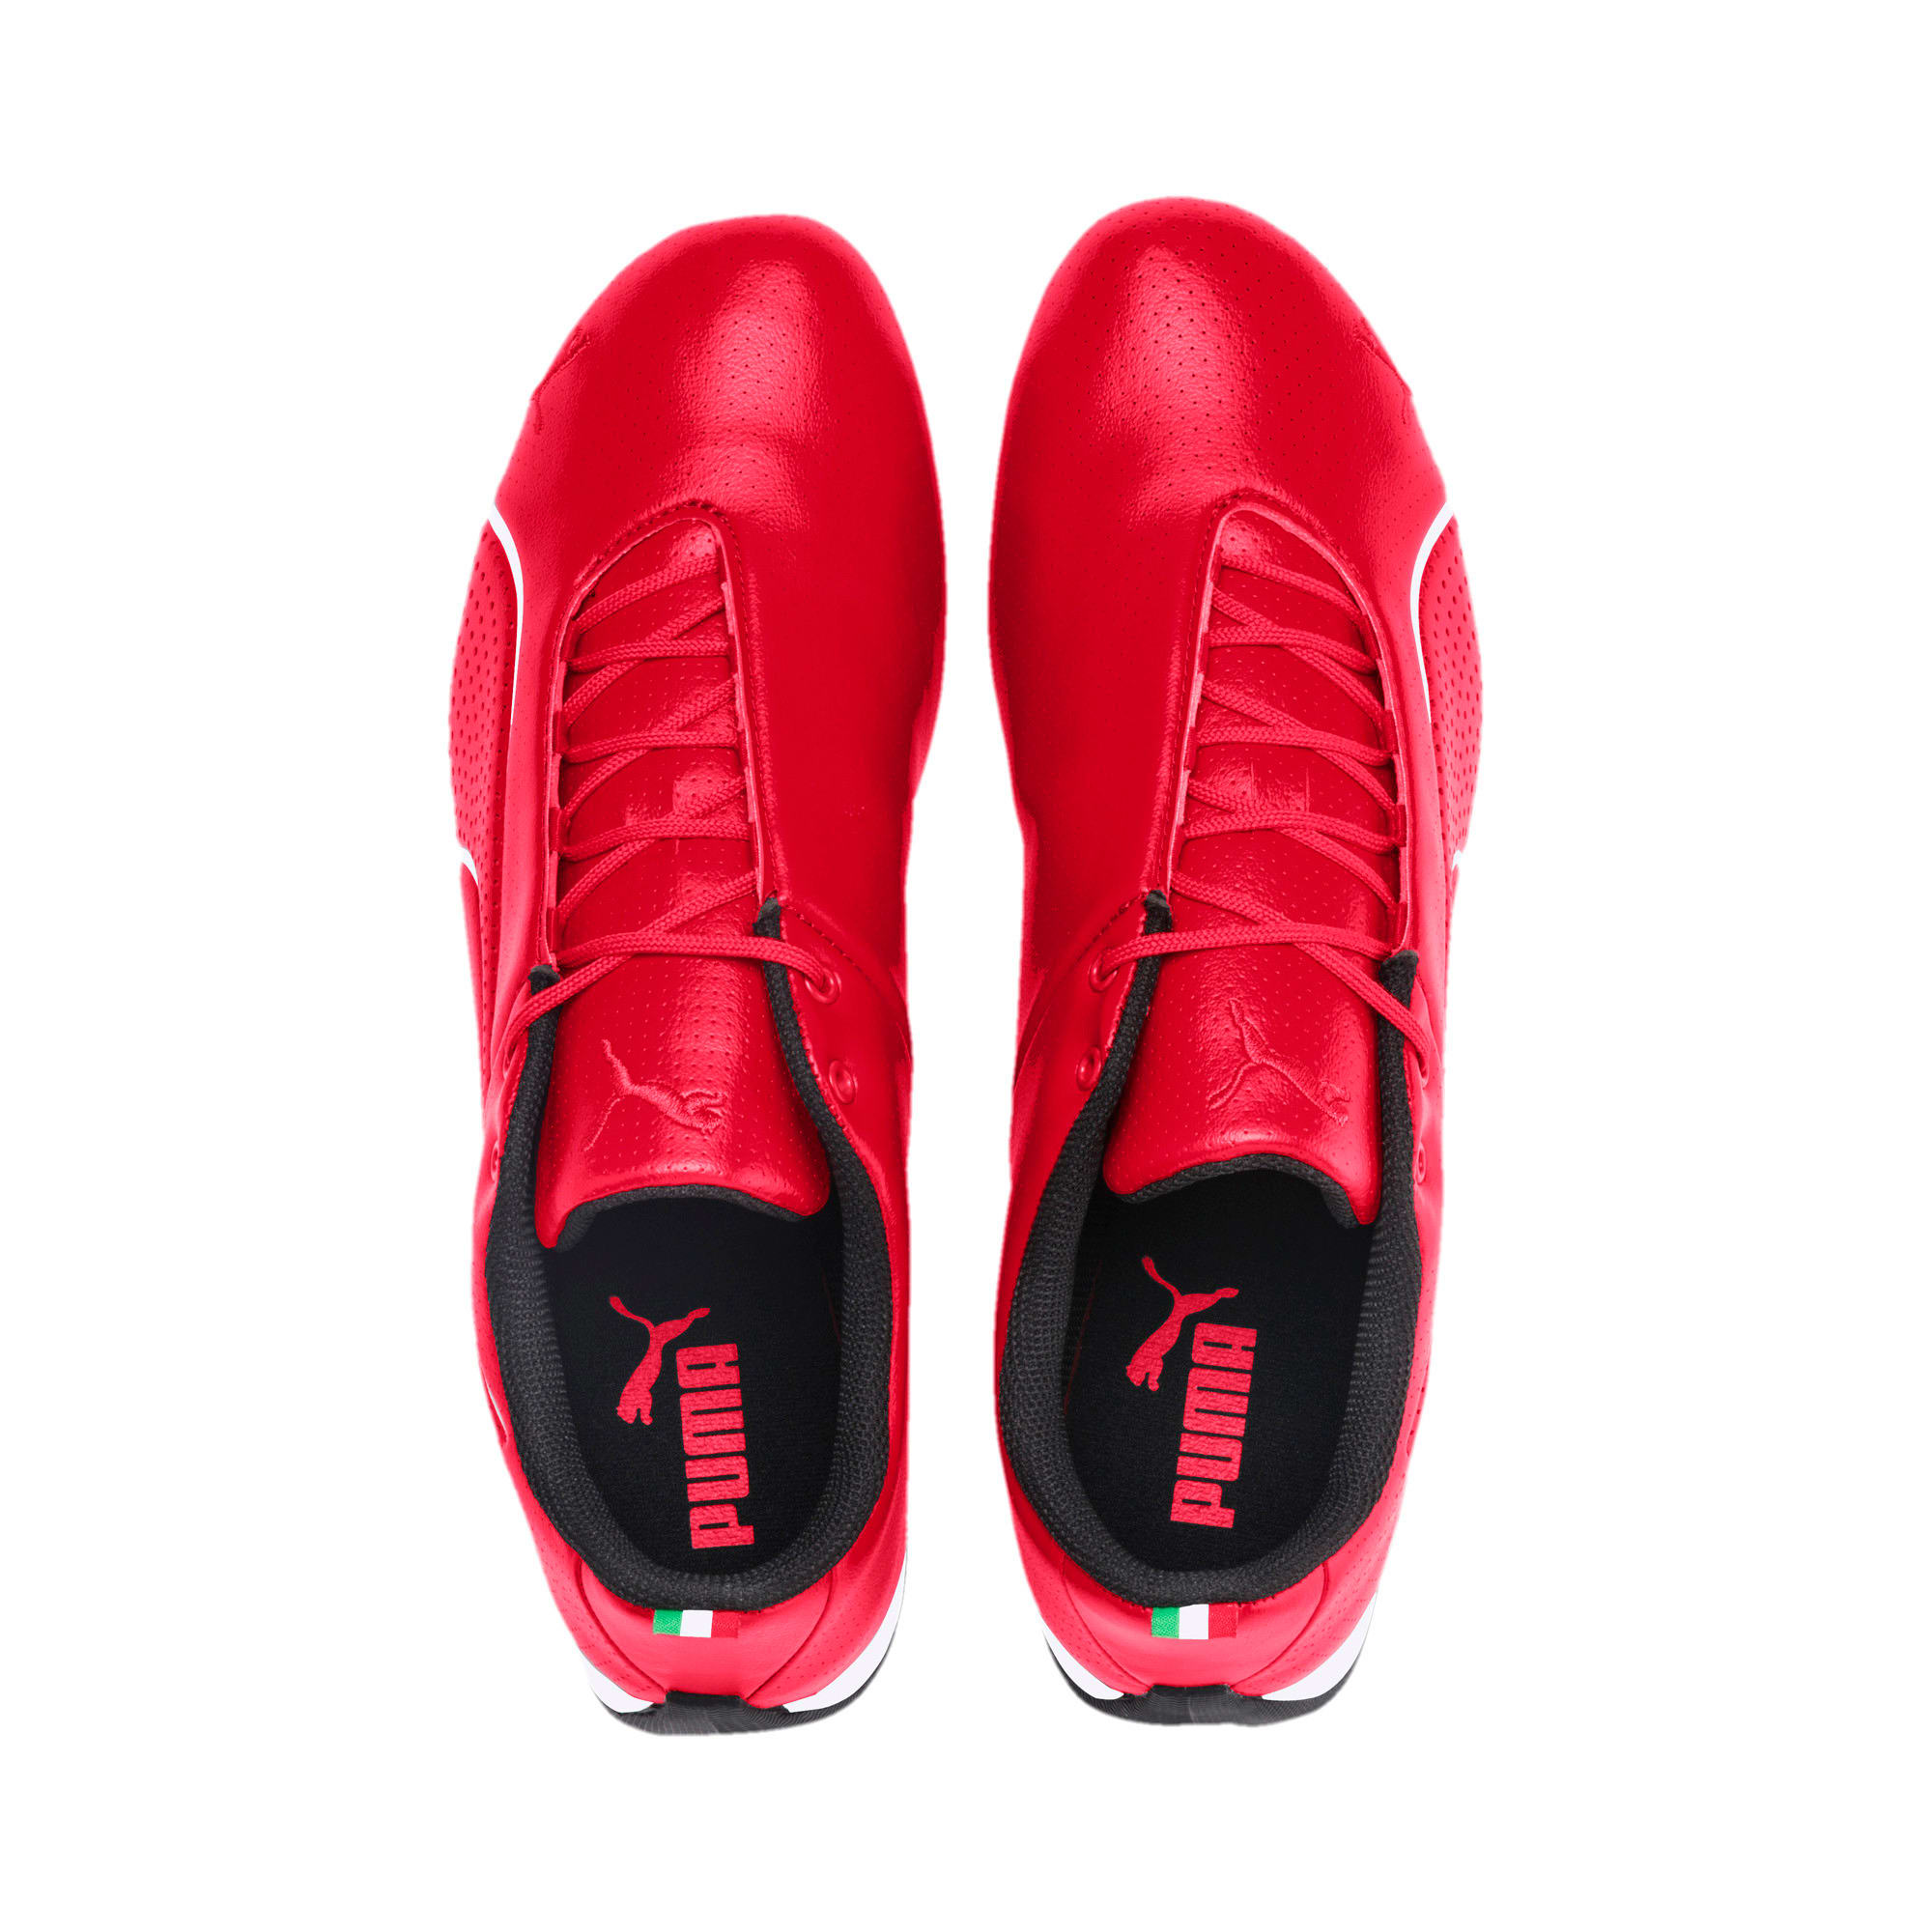 Thumbnail 6 of Scuderia Ferrari Future Cat Ultra Shoes, Rosso Corsa-Puma White, medium